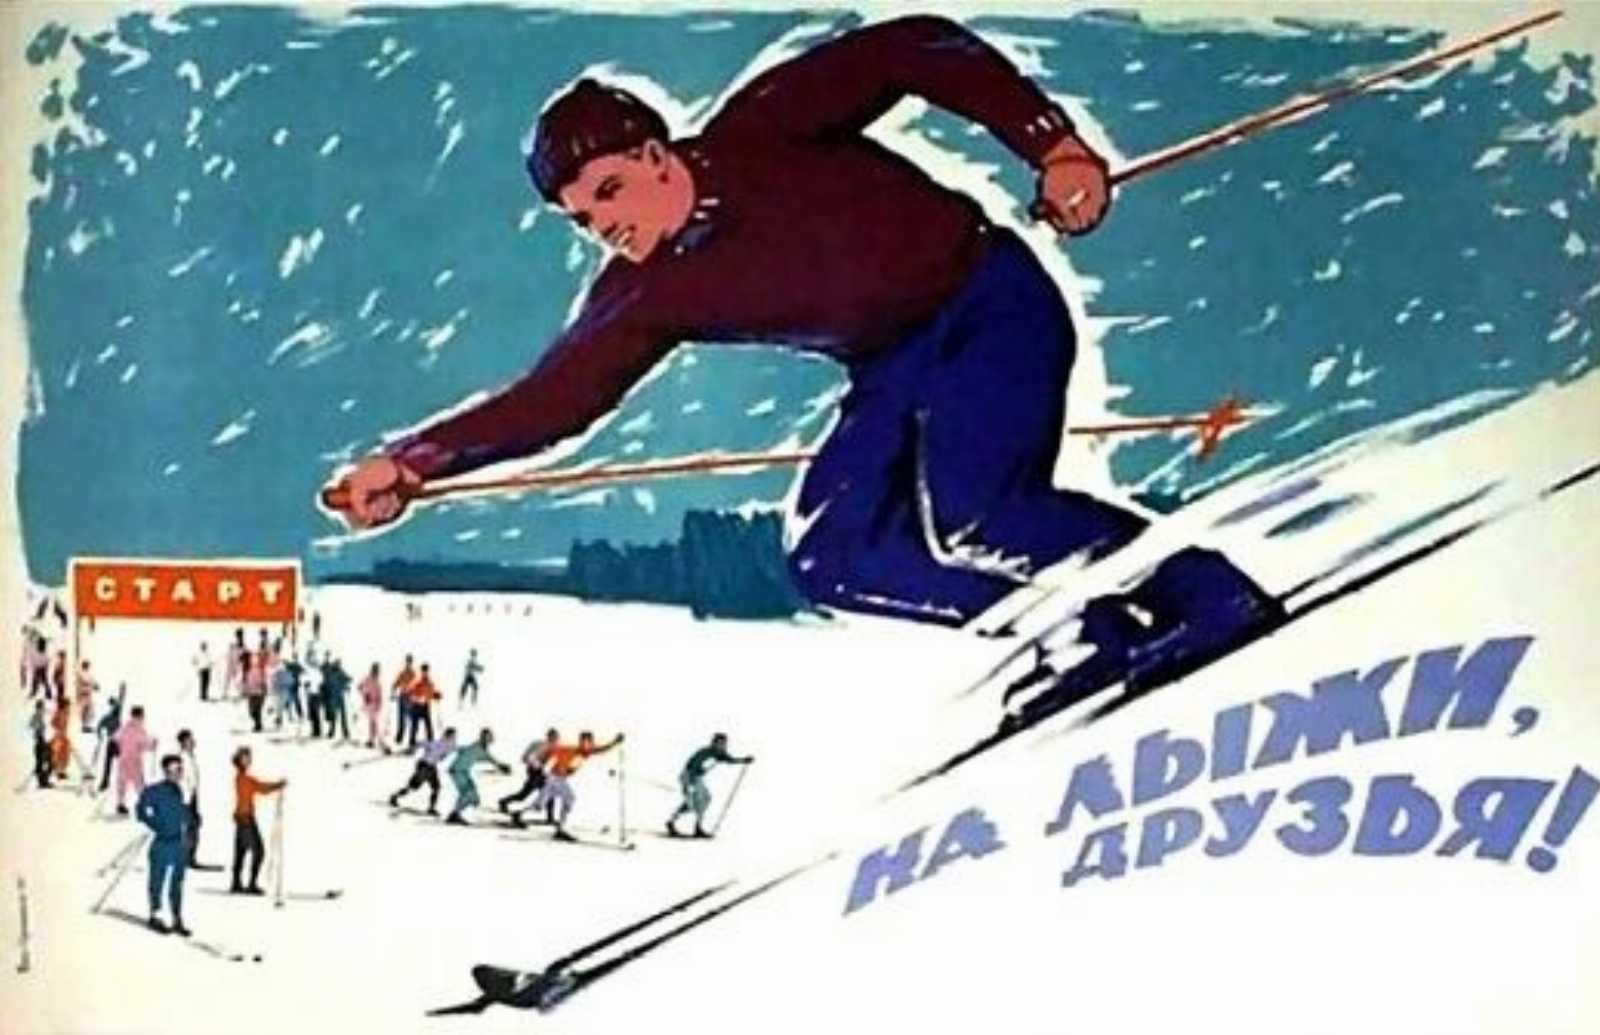 Лыжный Марафон, г. Борисов